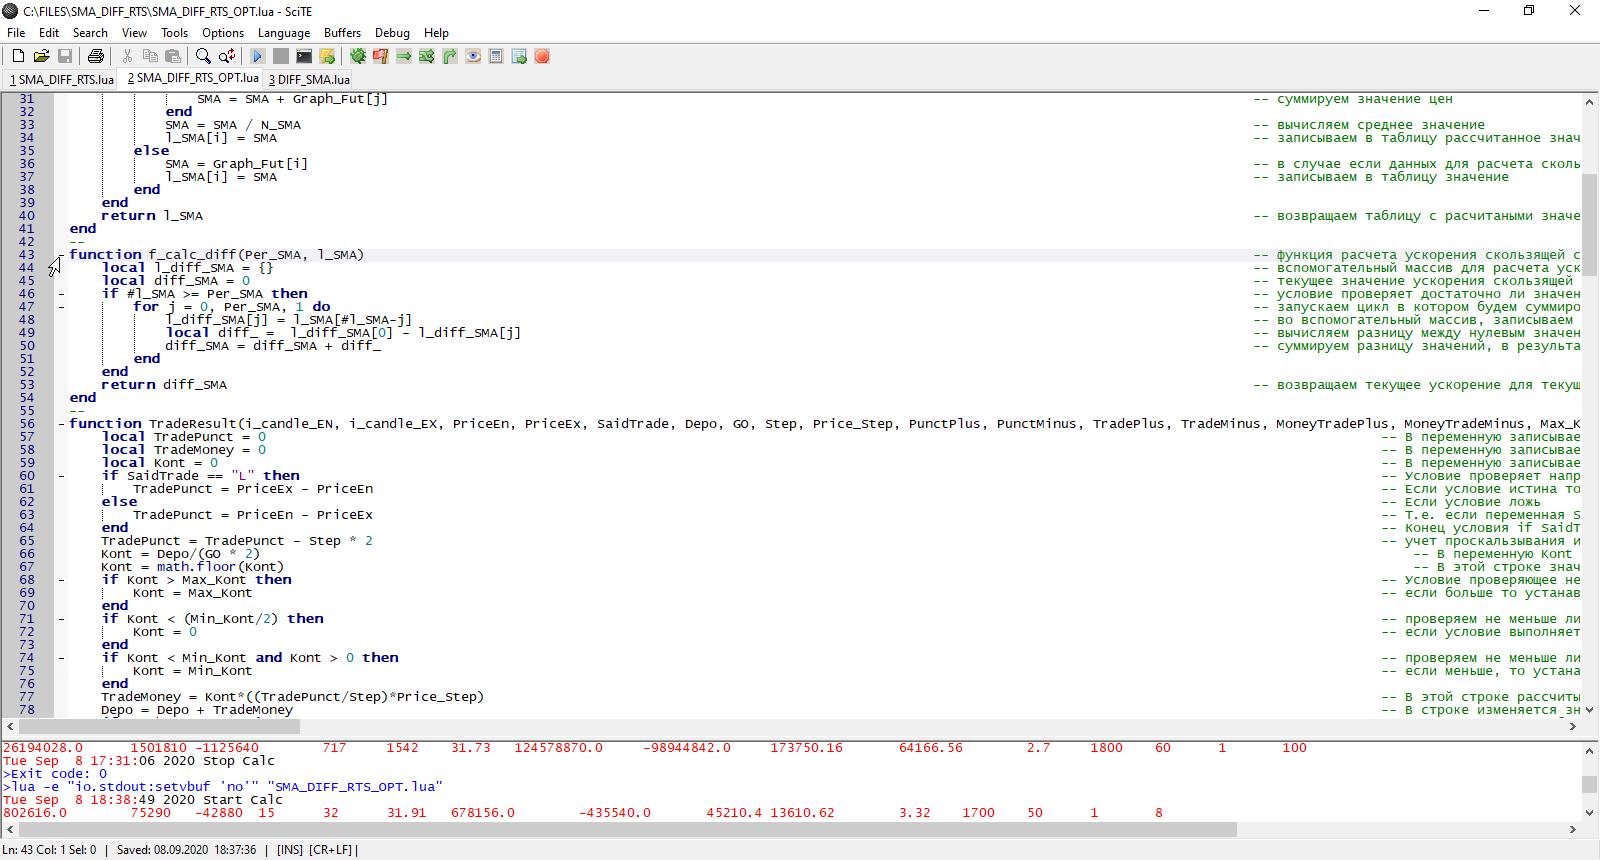 QUIK LUA функция расчета ускорения скользящей средней, фьючерс на индекс РТС